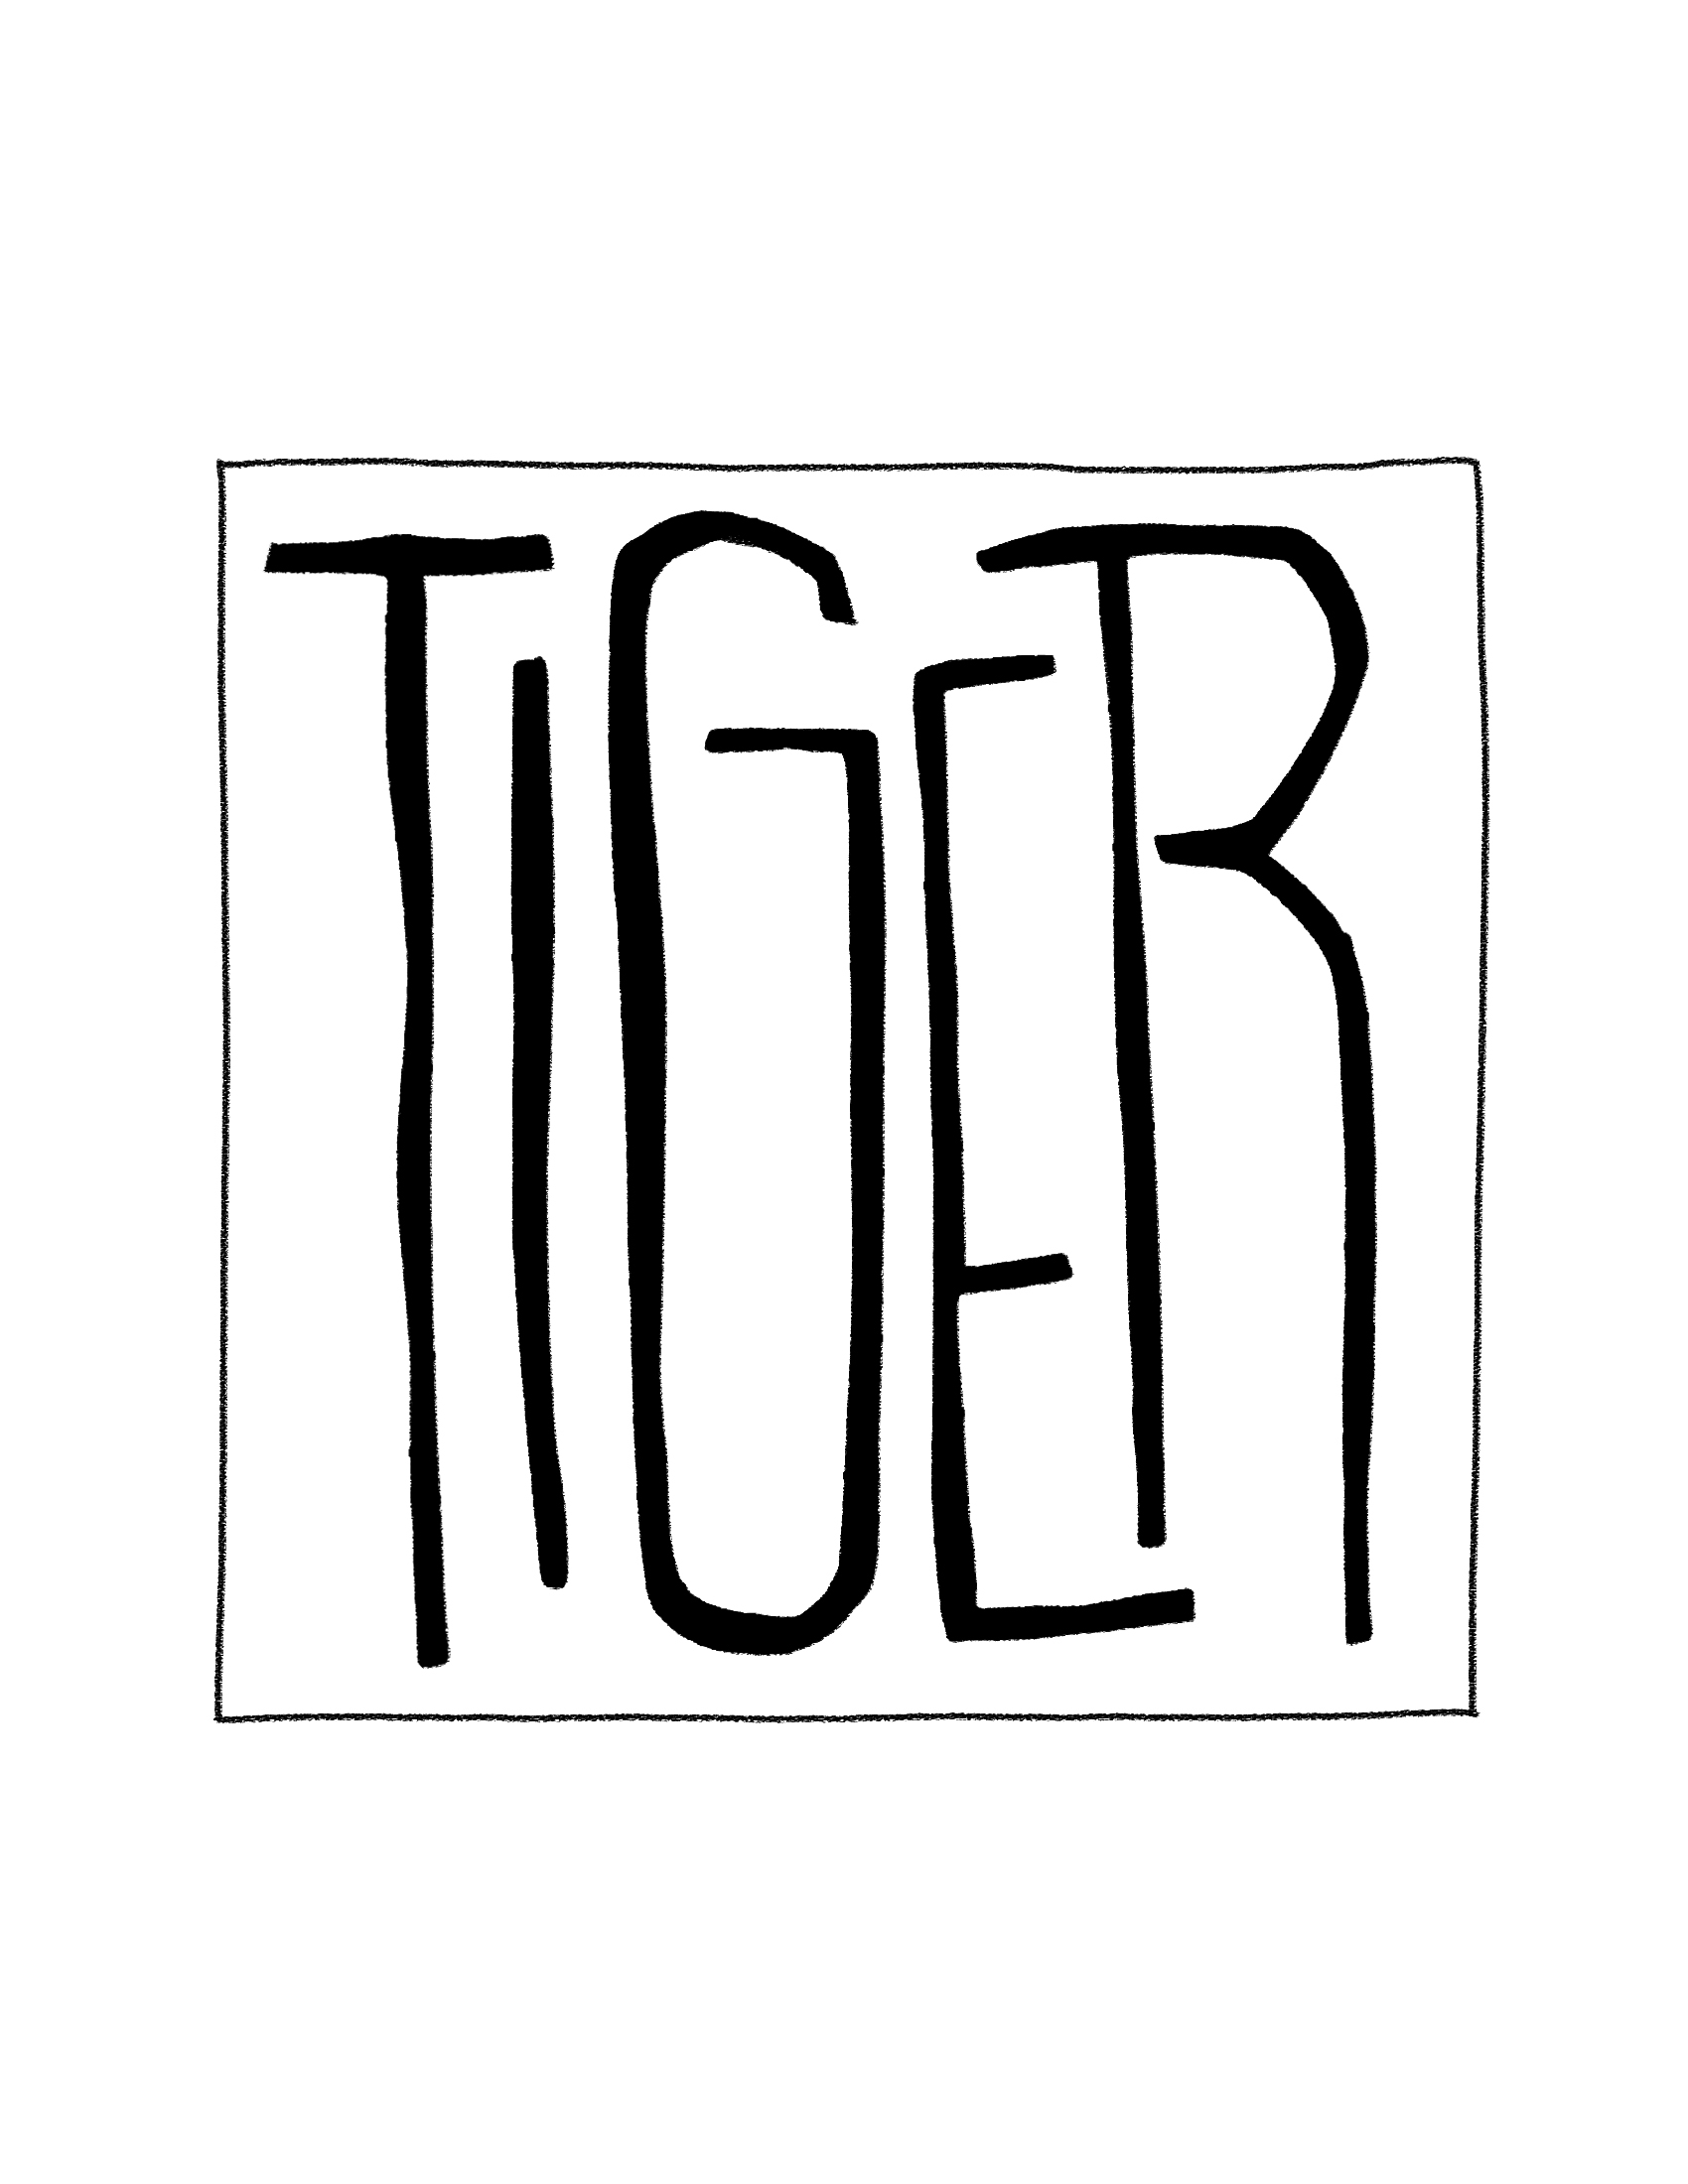 zodiac_0006_TIGER.jpg